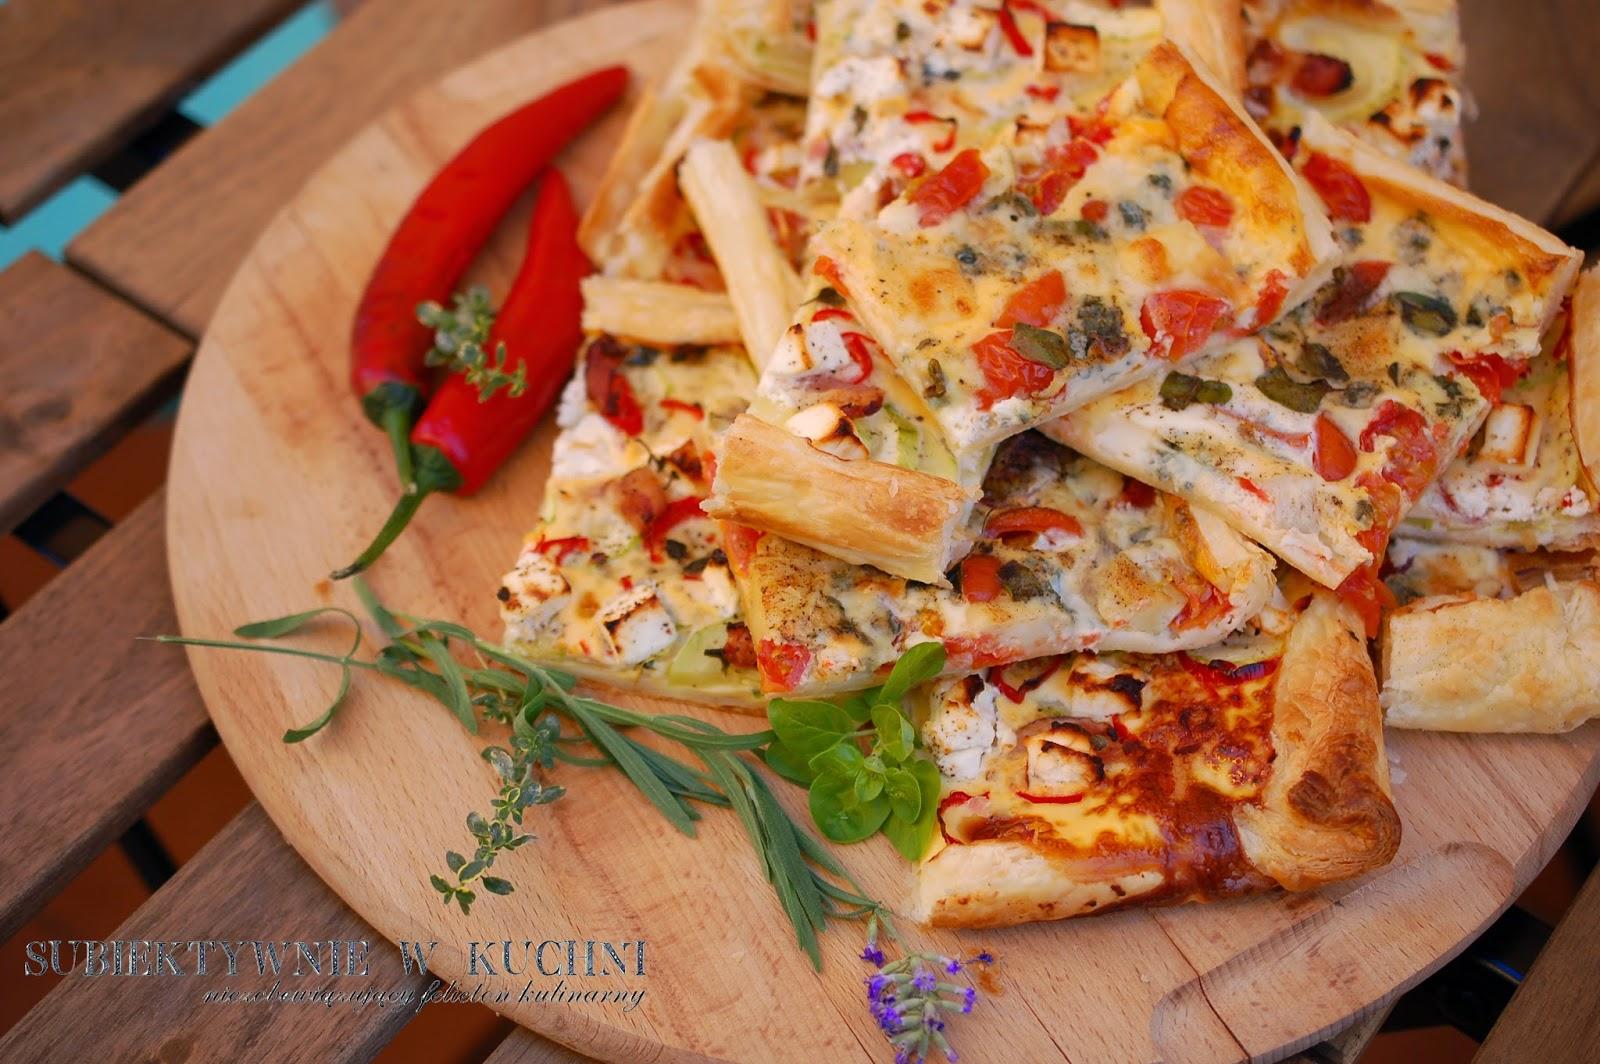 tarta z serem, tart with cheese, Tarte mit Käse, Tarta de queso, Tarte au fromage